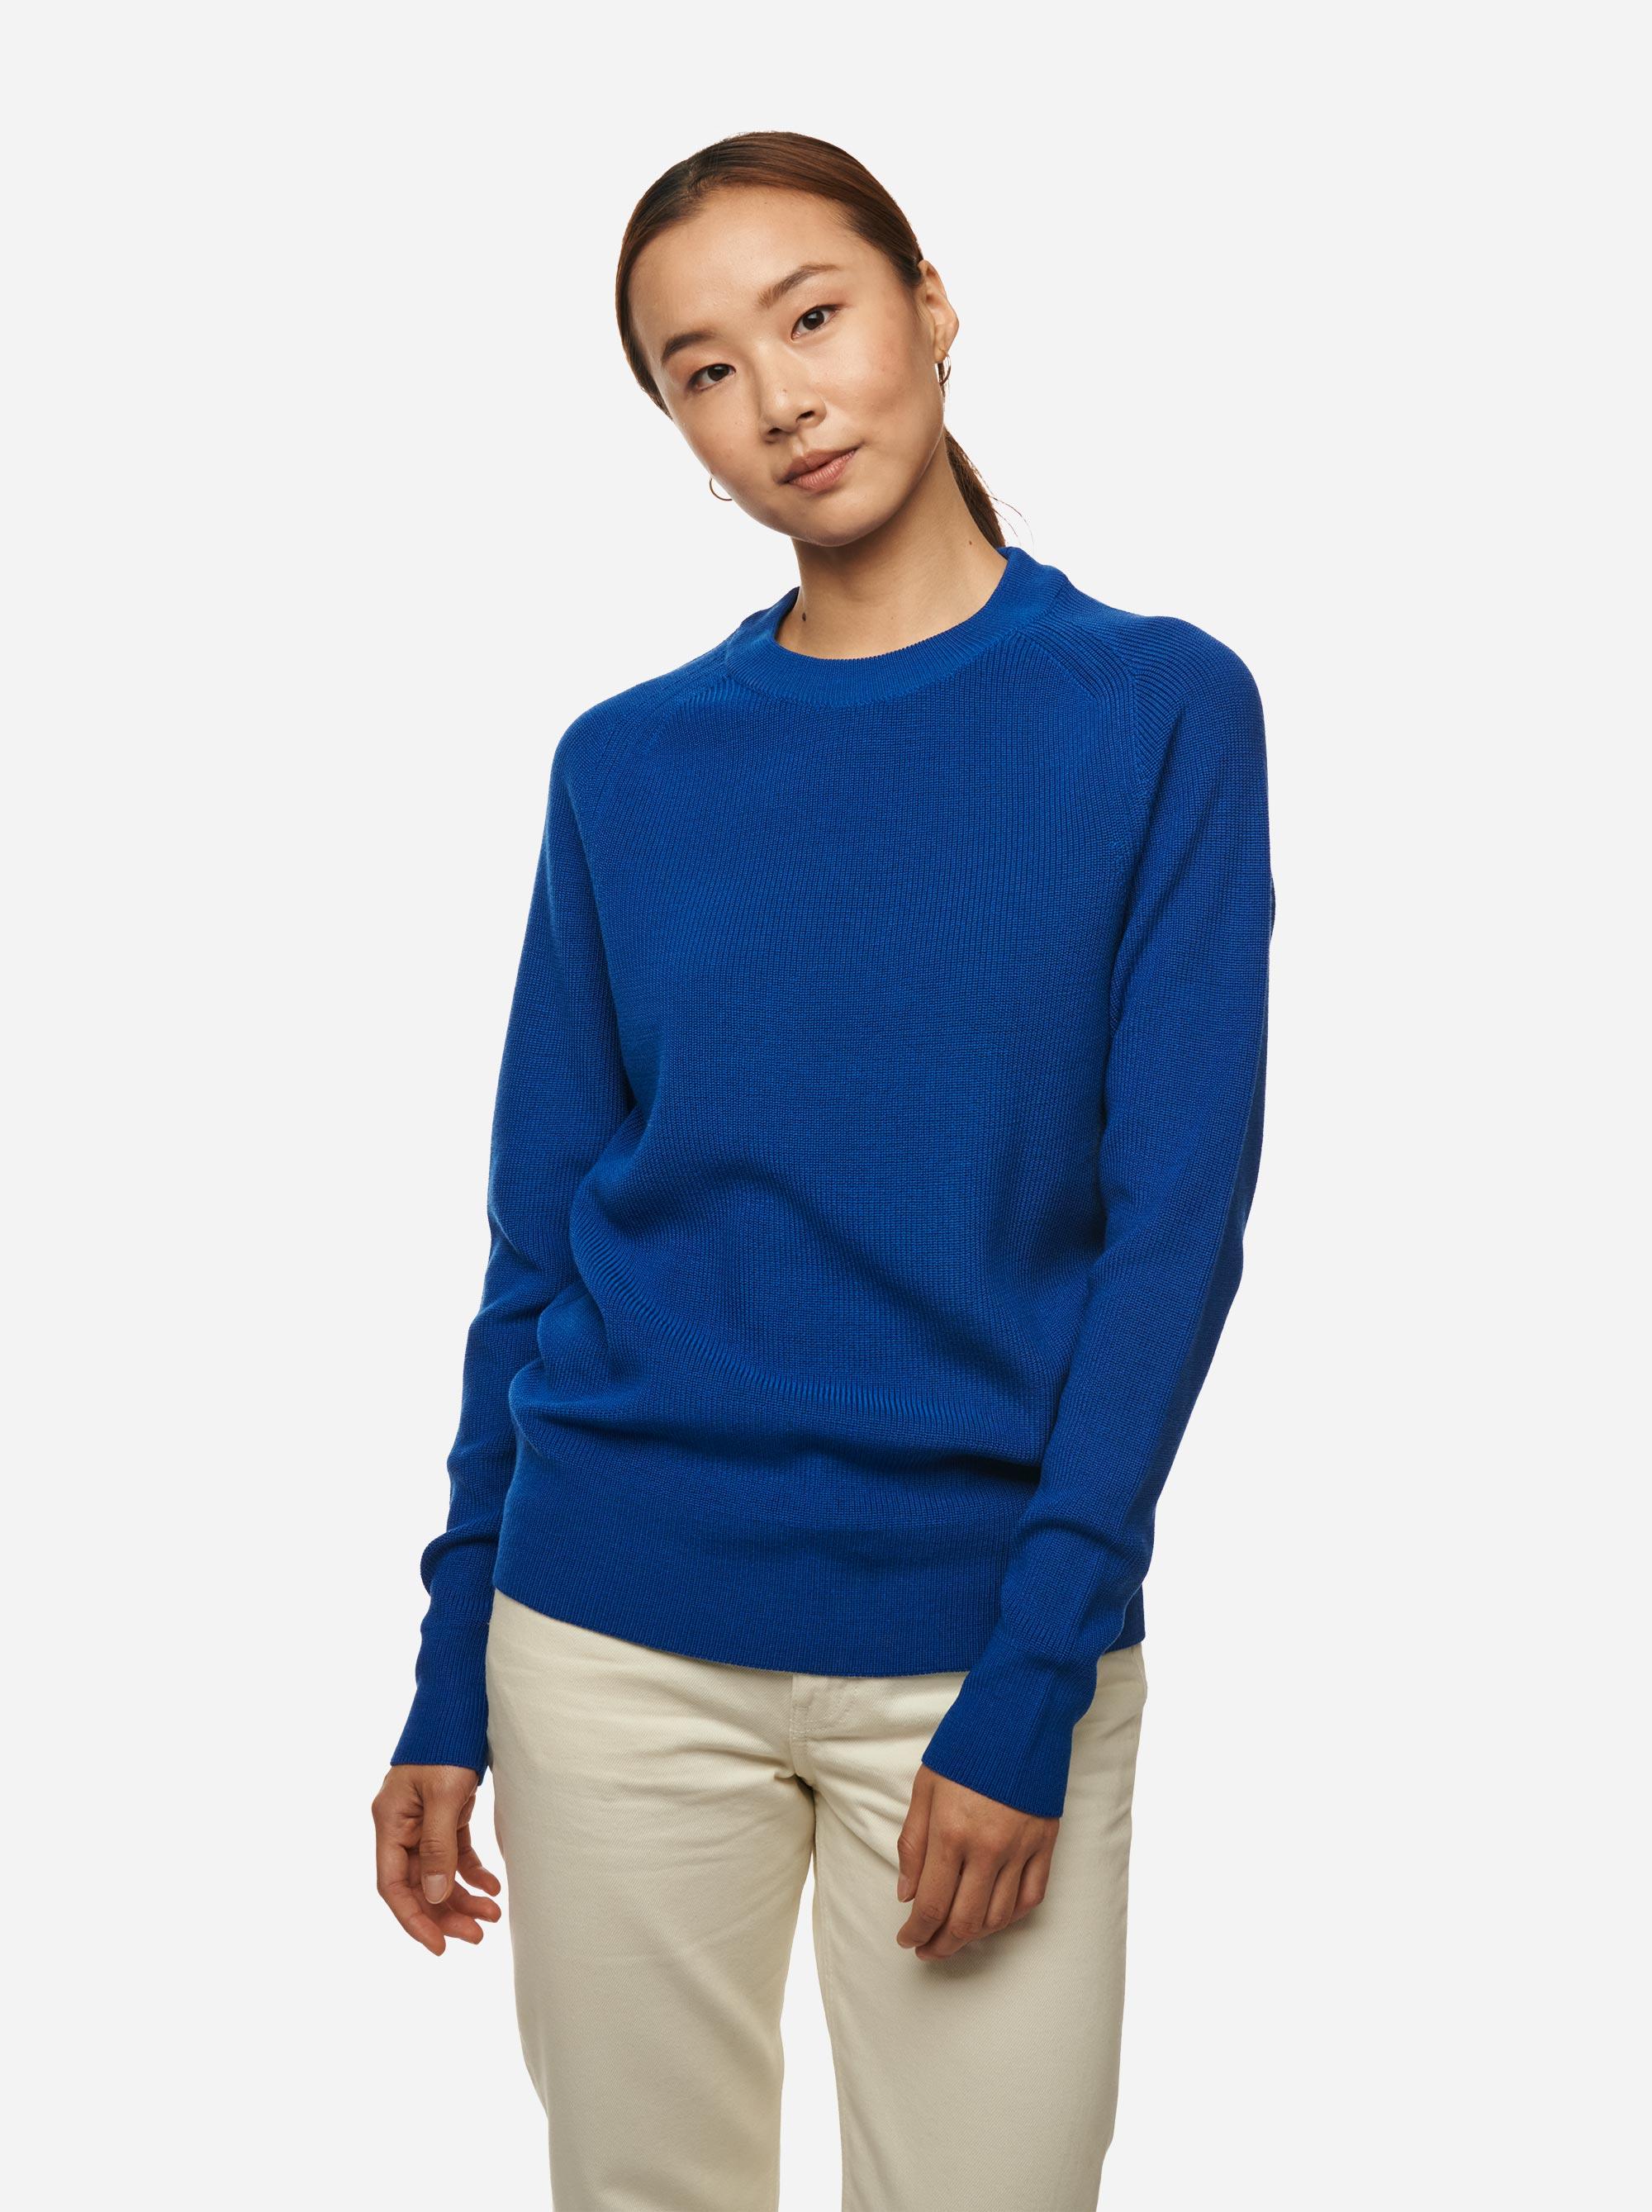 Teym - Crewneck - The Merino Sweater - Women - Cobalt Blue - 2